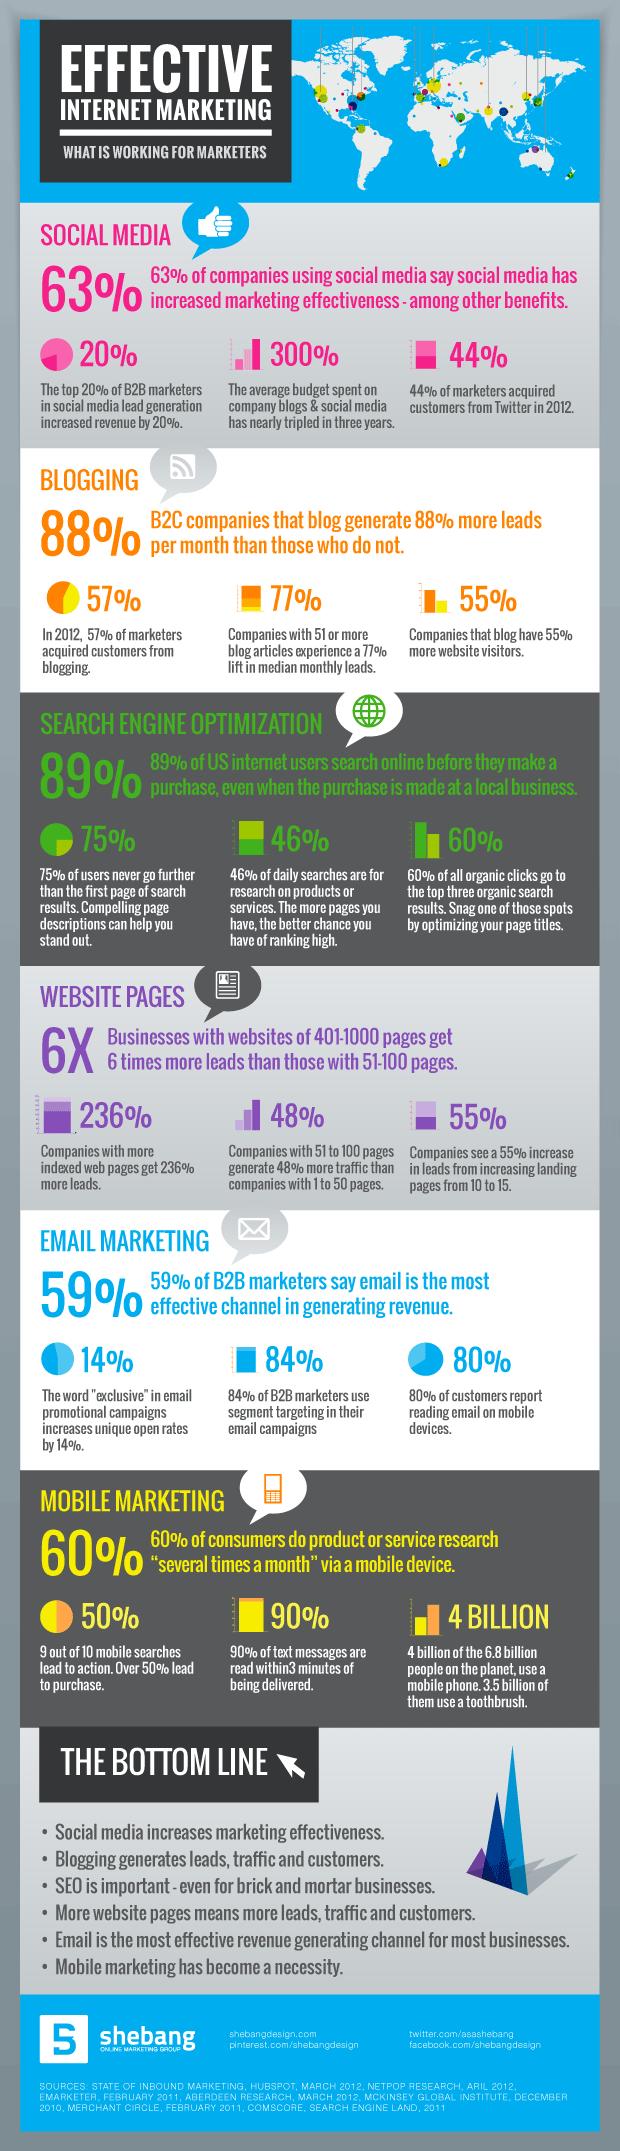 Effective-internet-marketing